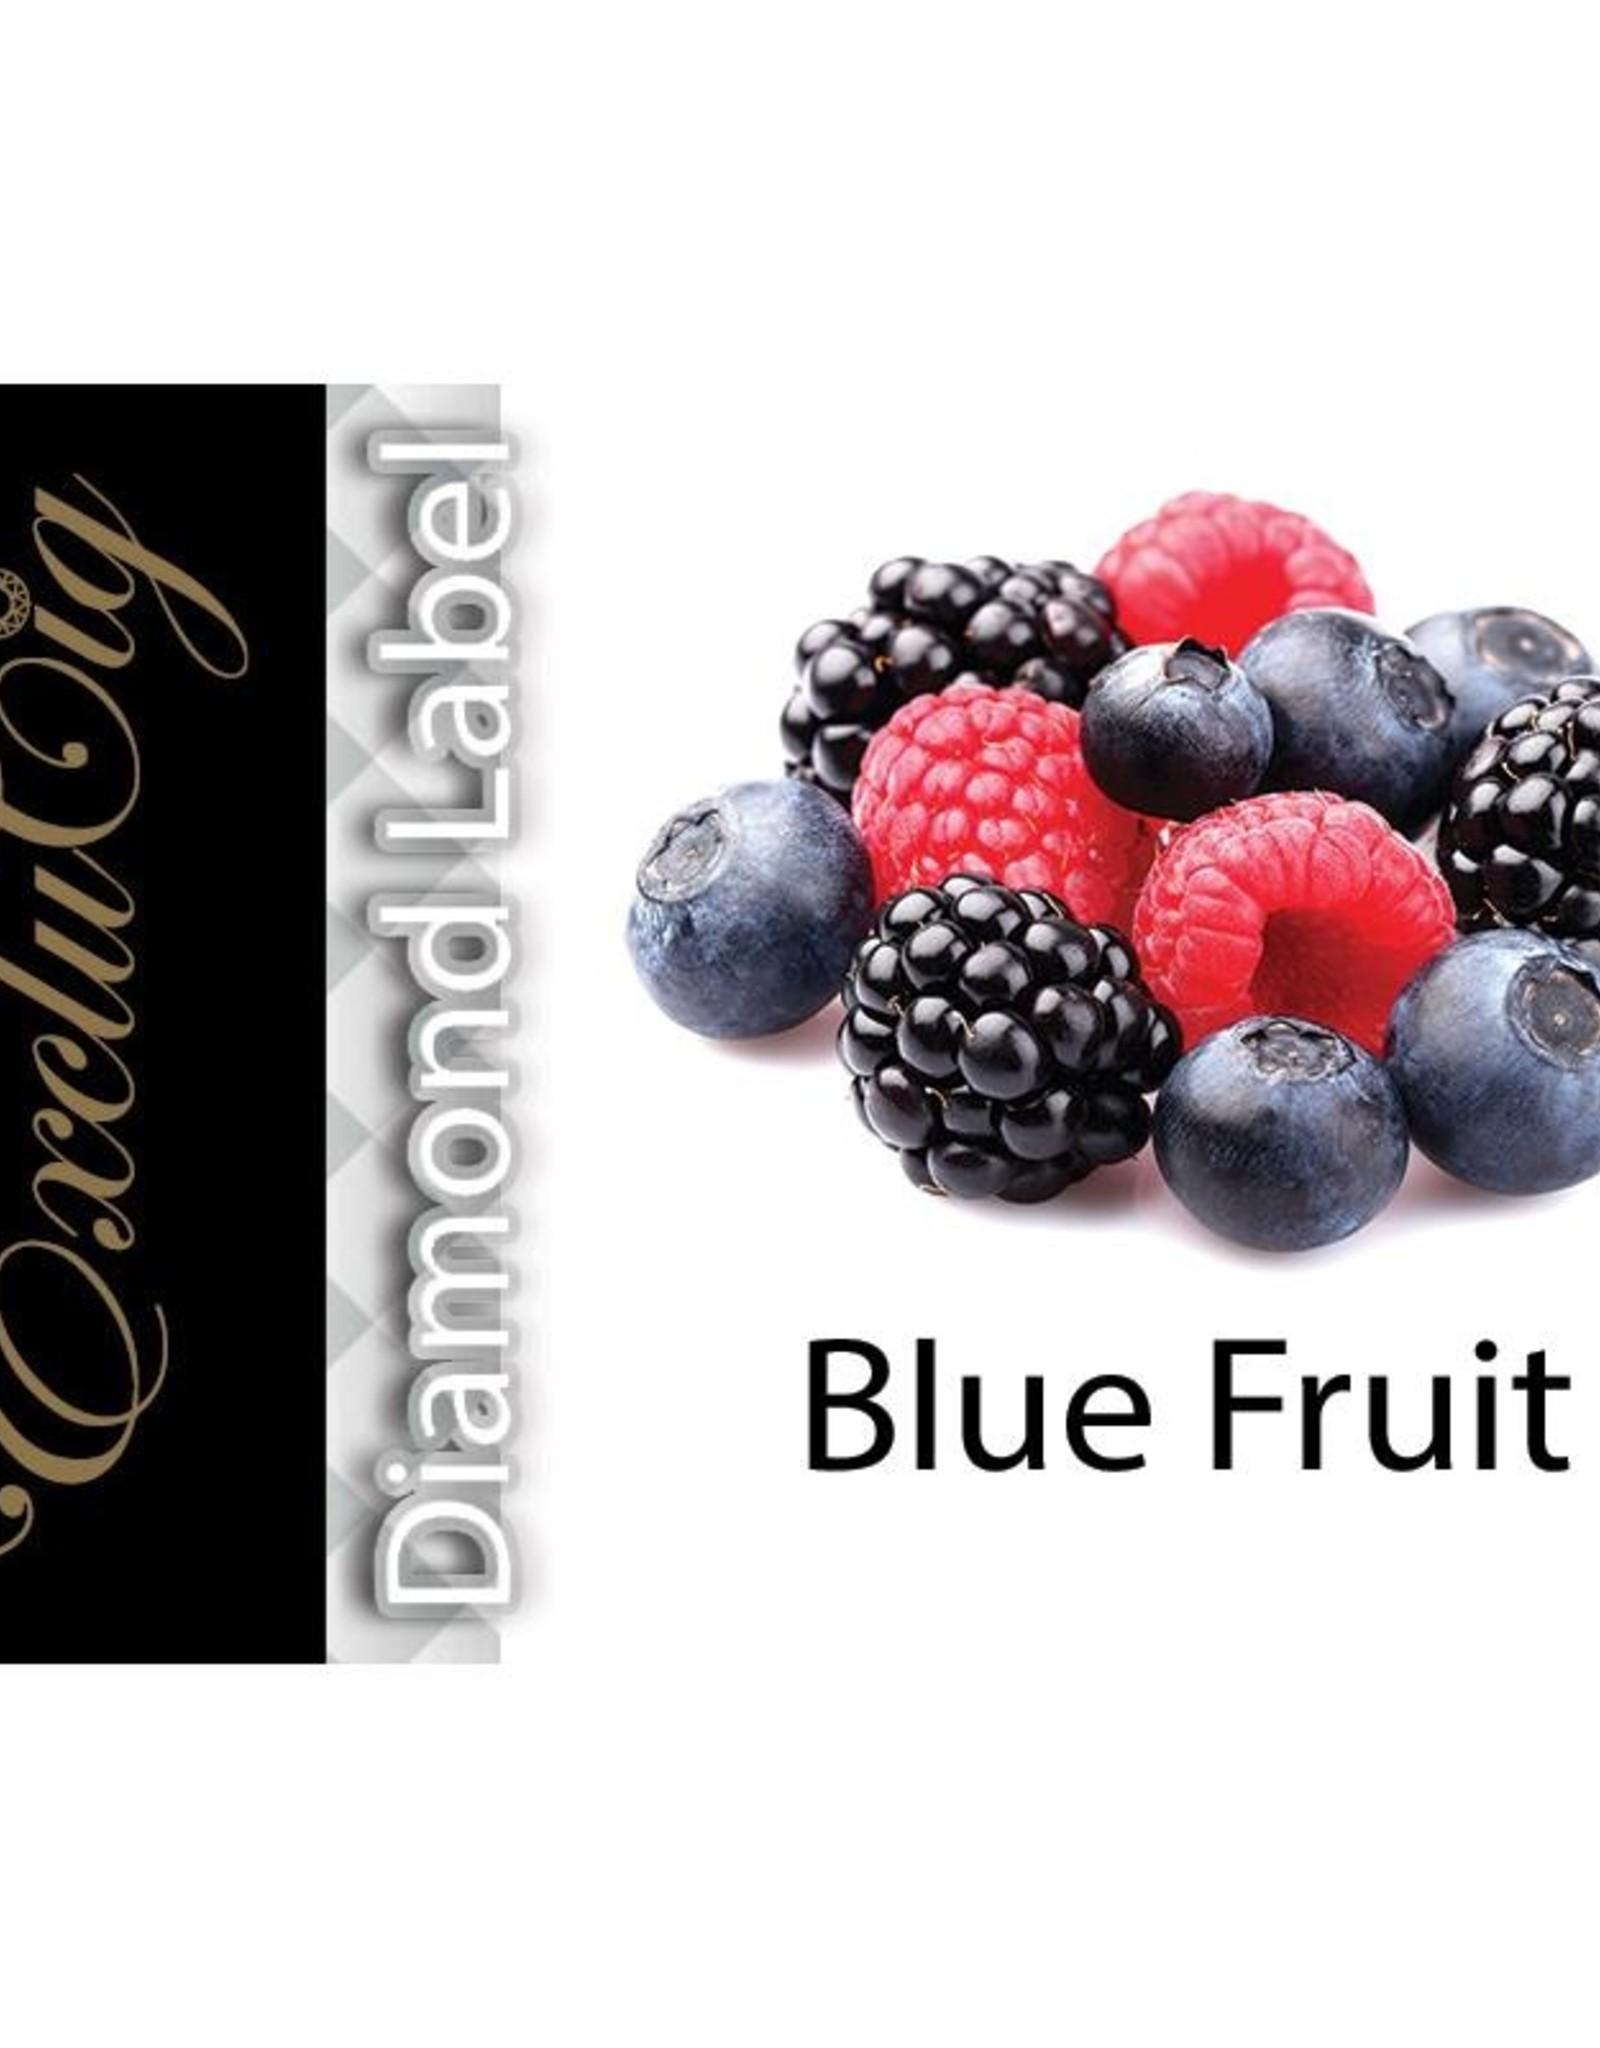 Exclucig Exclucig Diamond Label E-liquid Blue Fruit 6 mg Nicotine